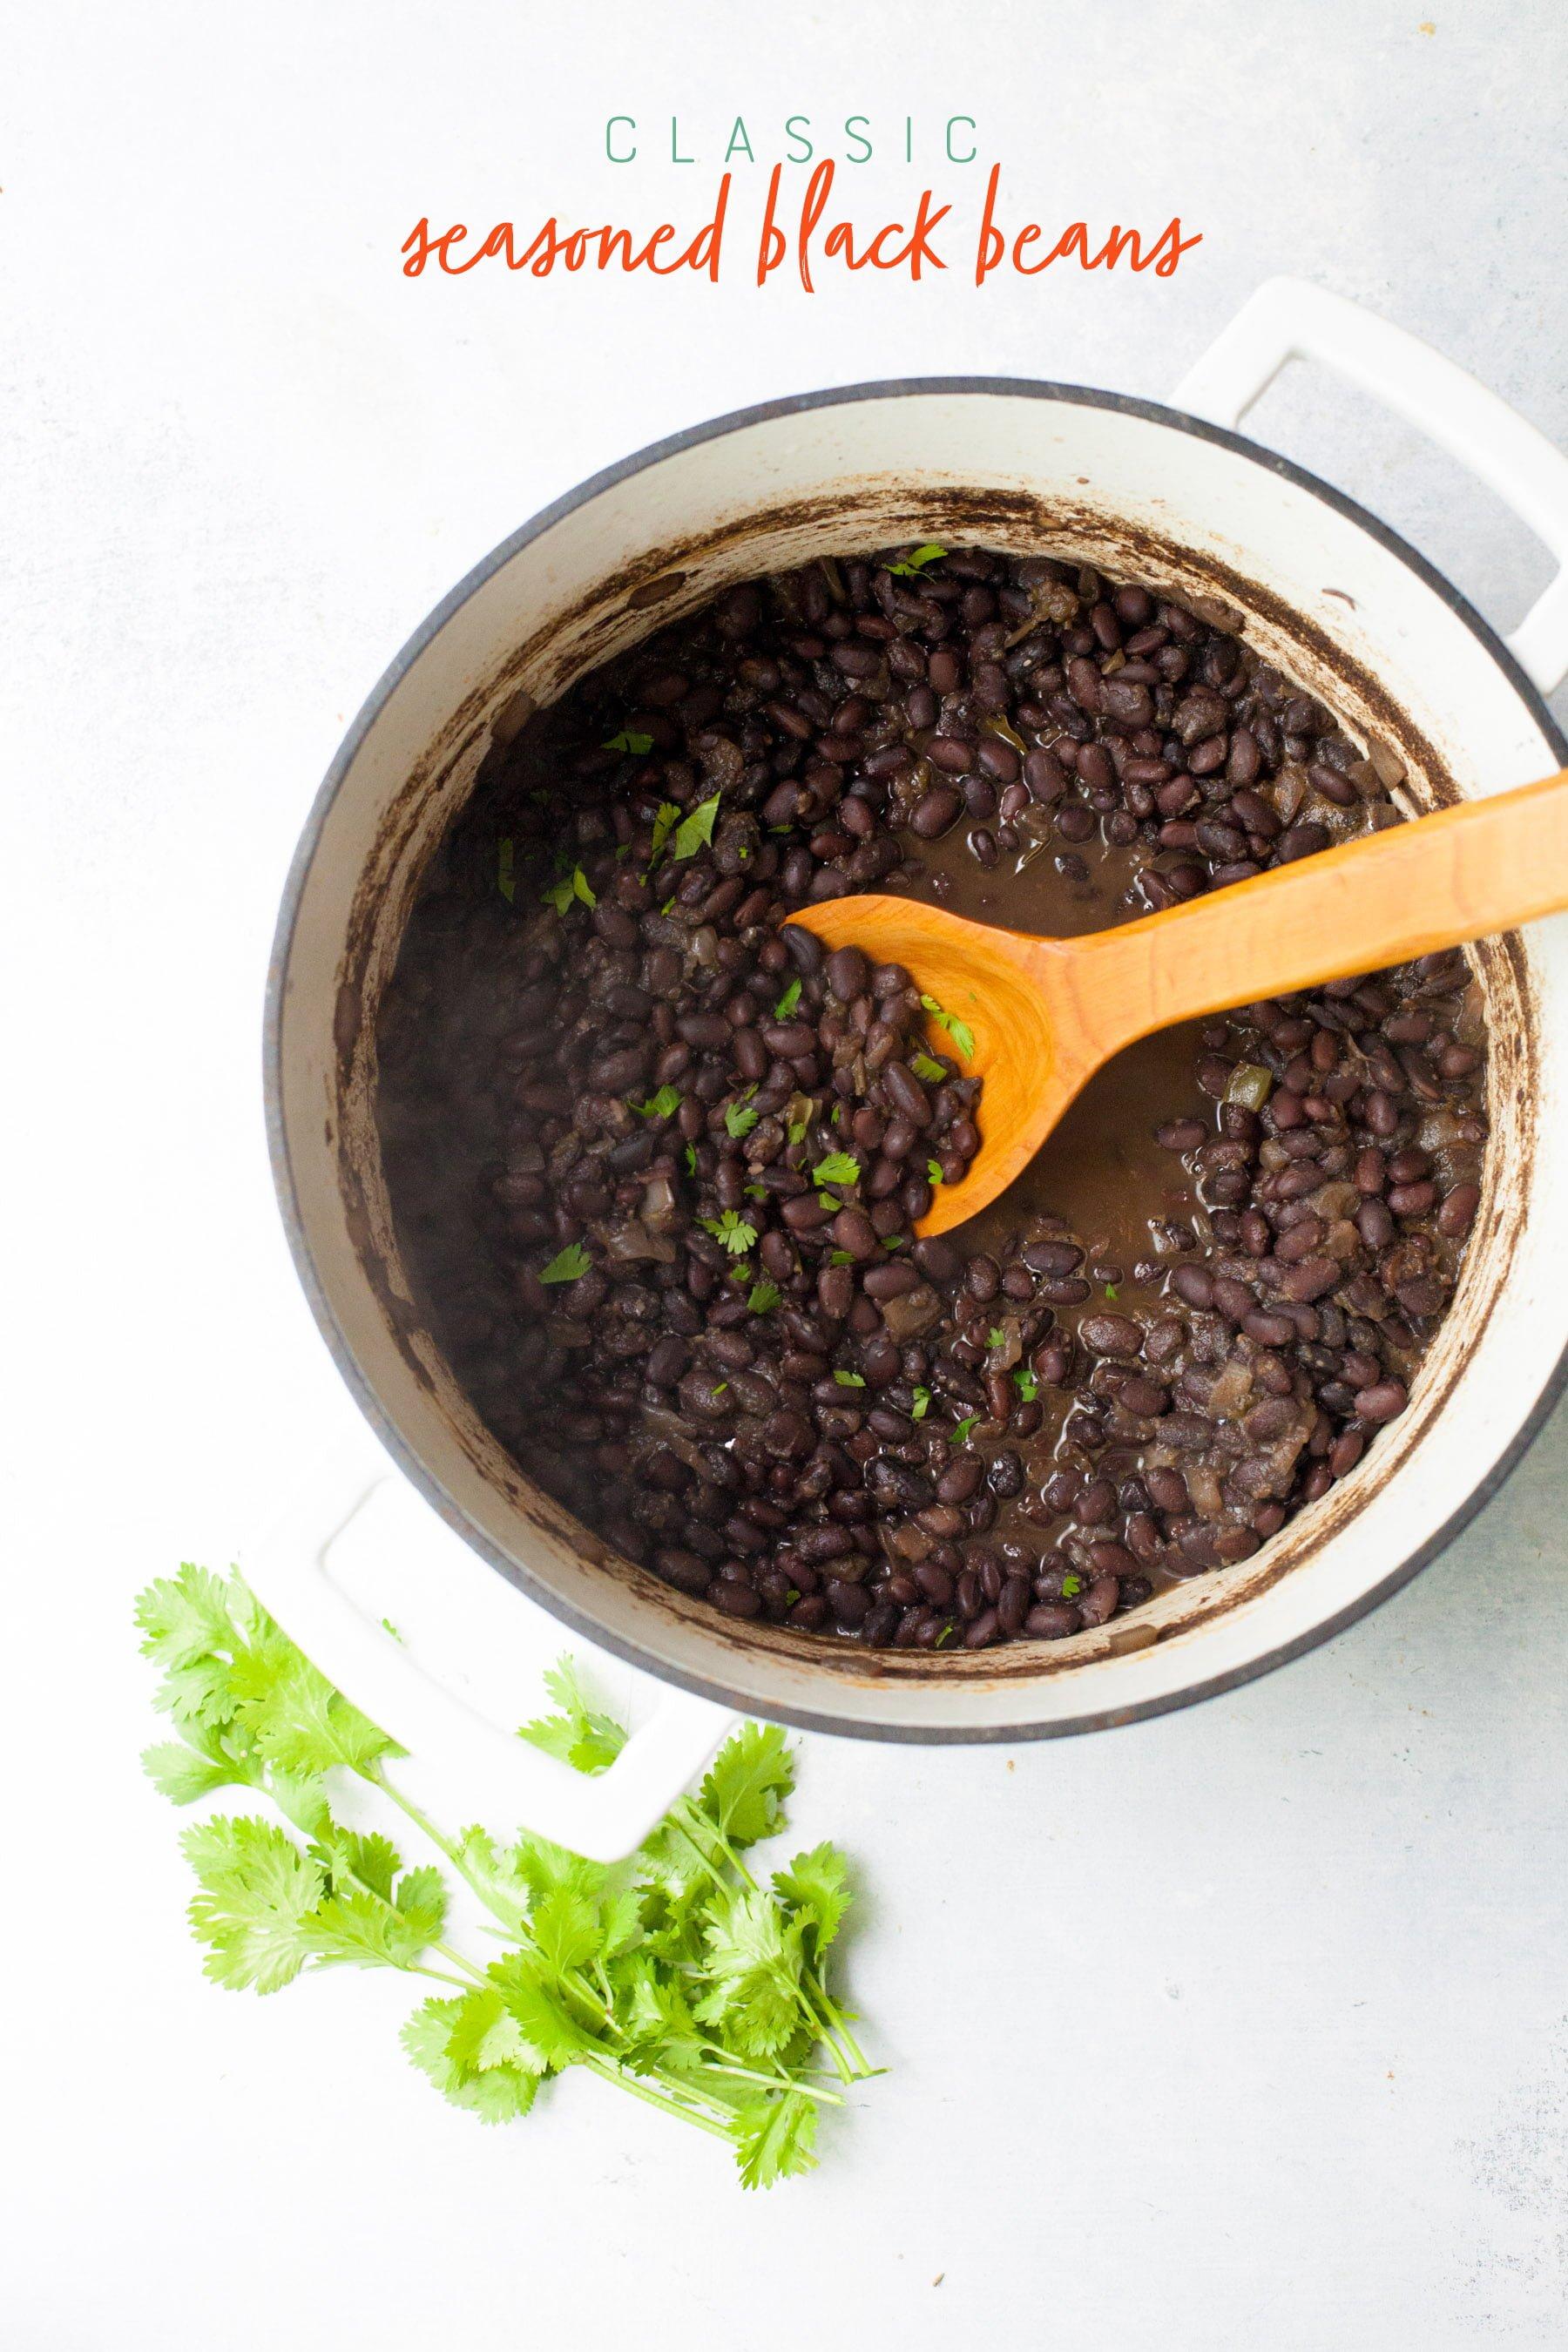 Classic Seasoned Black Beans